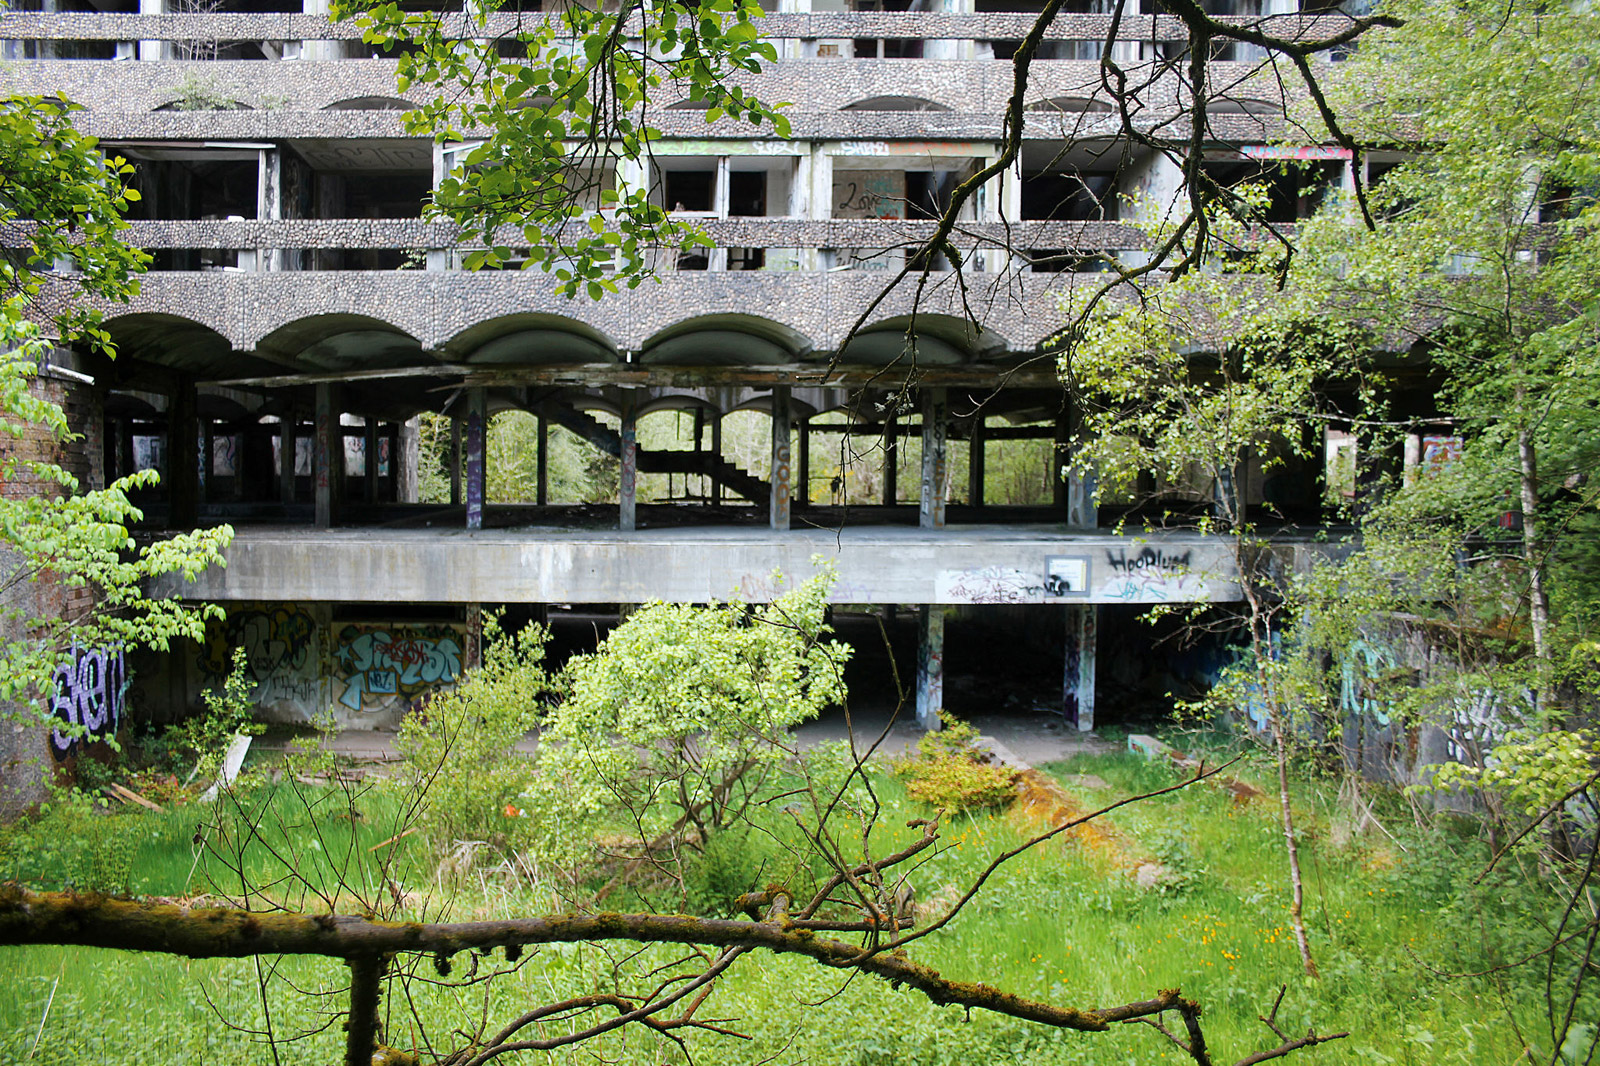 St.-Peter's-Seminary,-Cardross.-Architects-Gillespie,-Kidd-&-Coia,-1966.-Photography--Trevor-Patt.-Exterior-facade